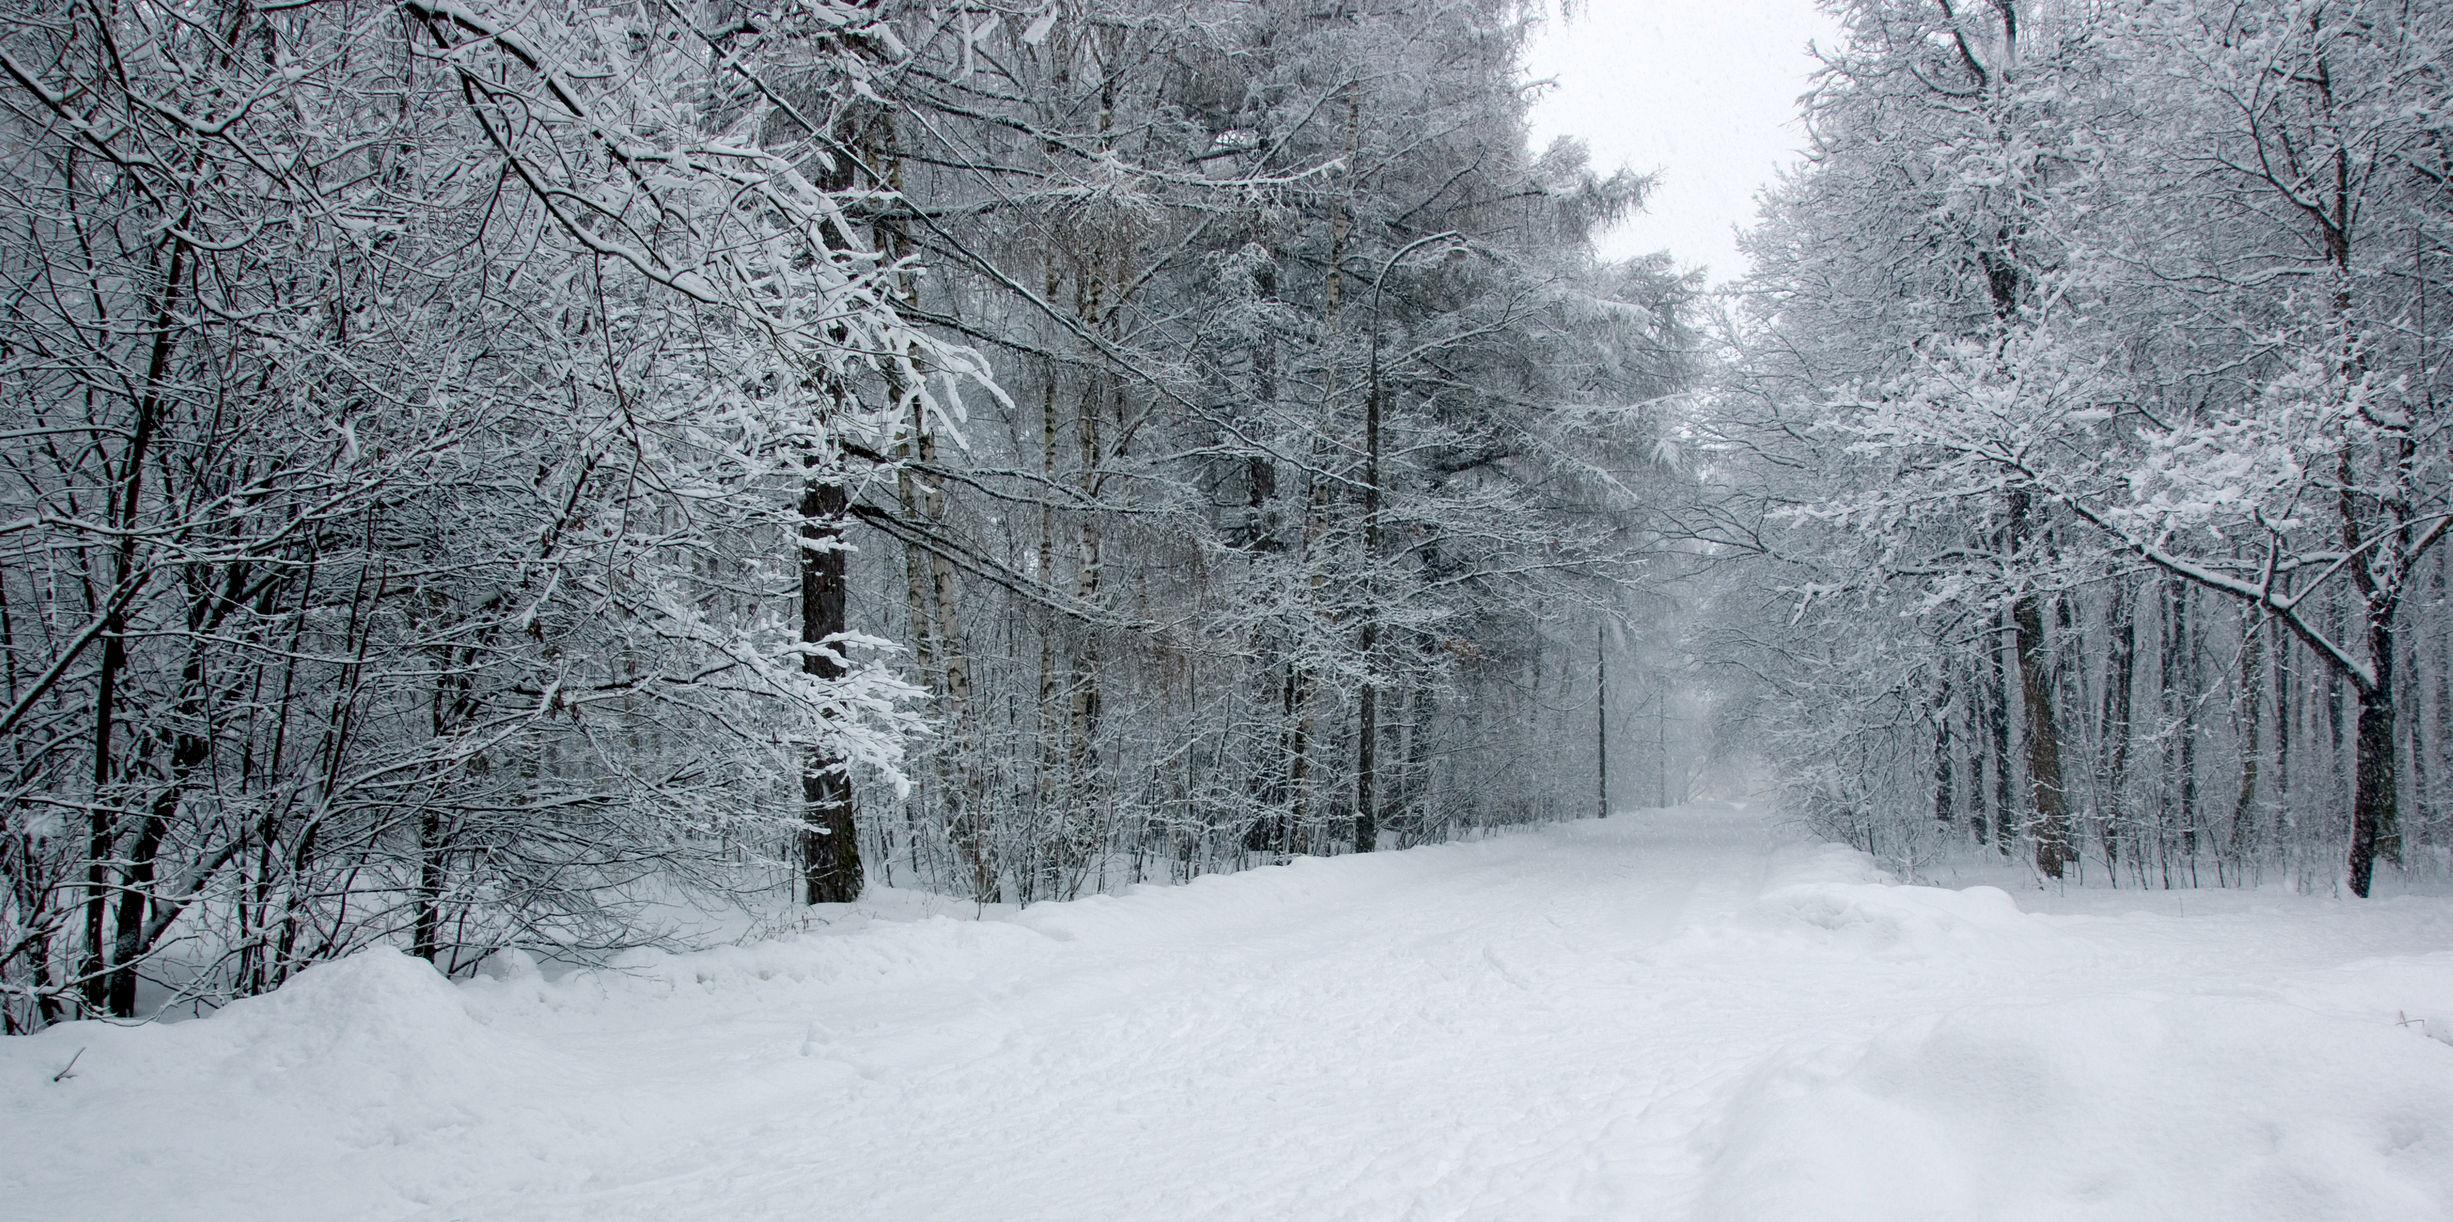 SNOW PARK © Alkolin | Dreamstime.com